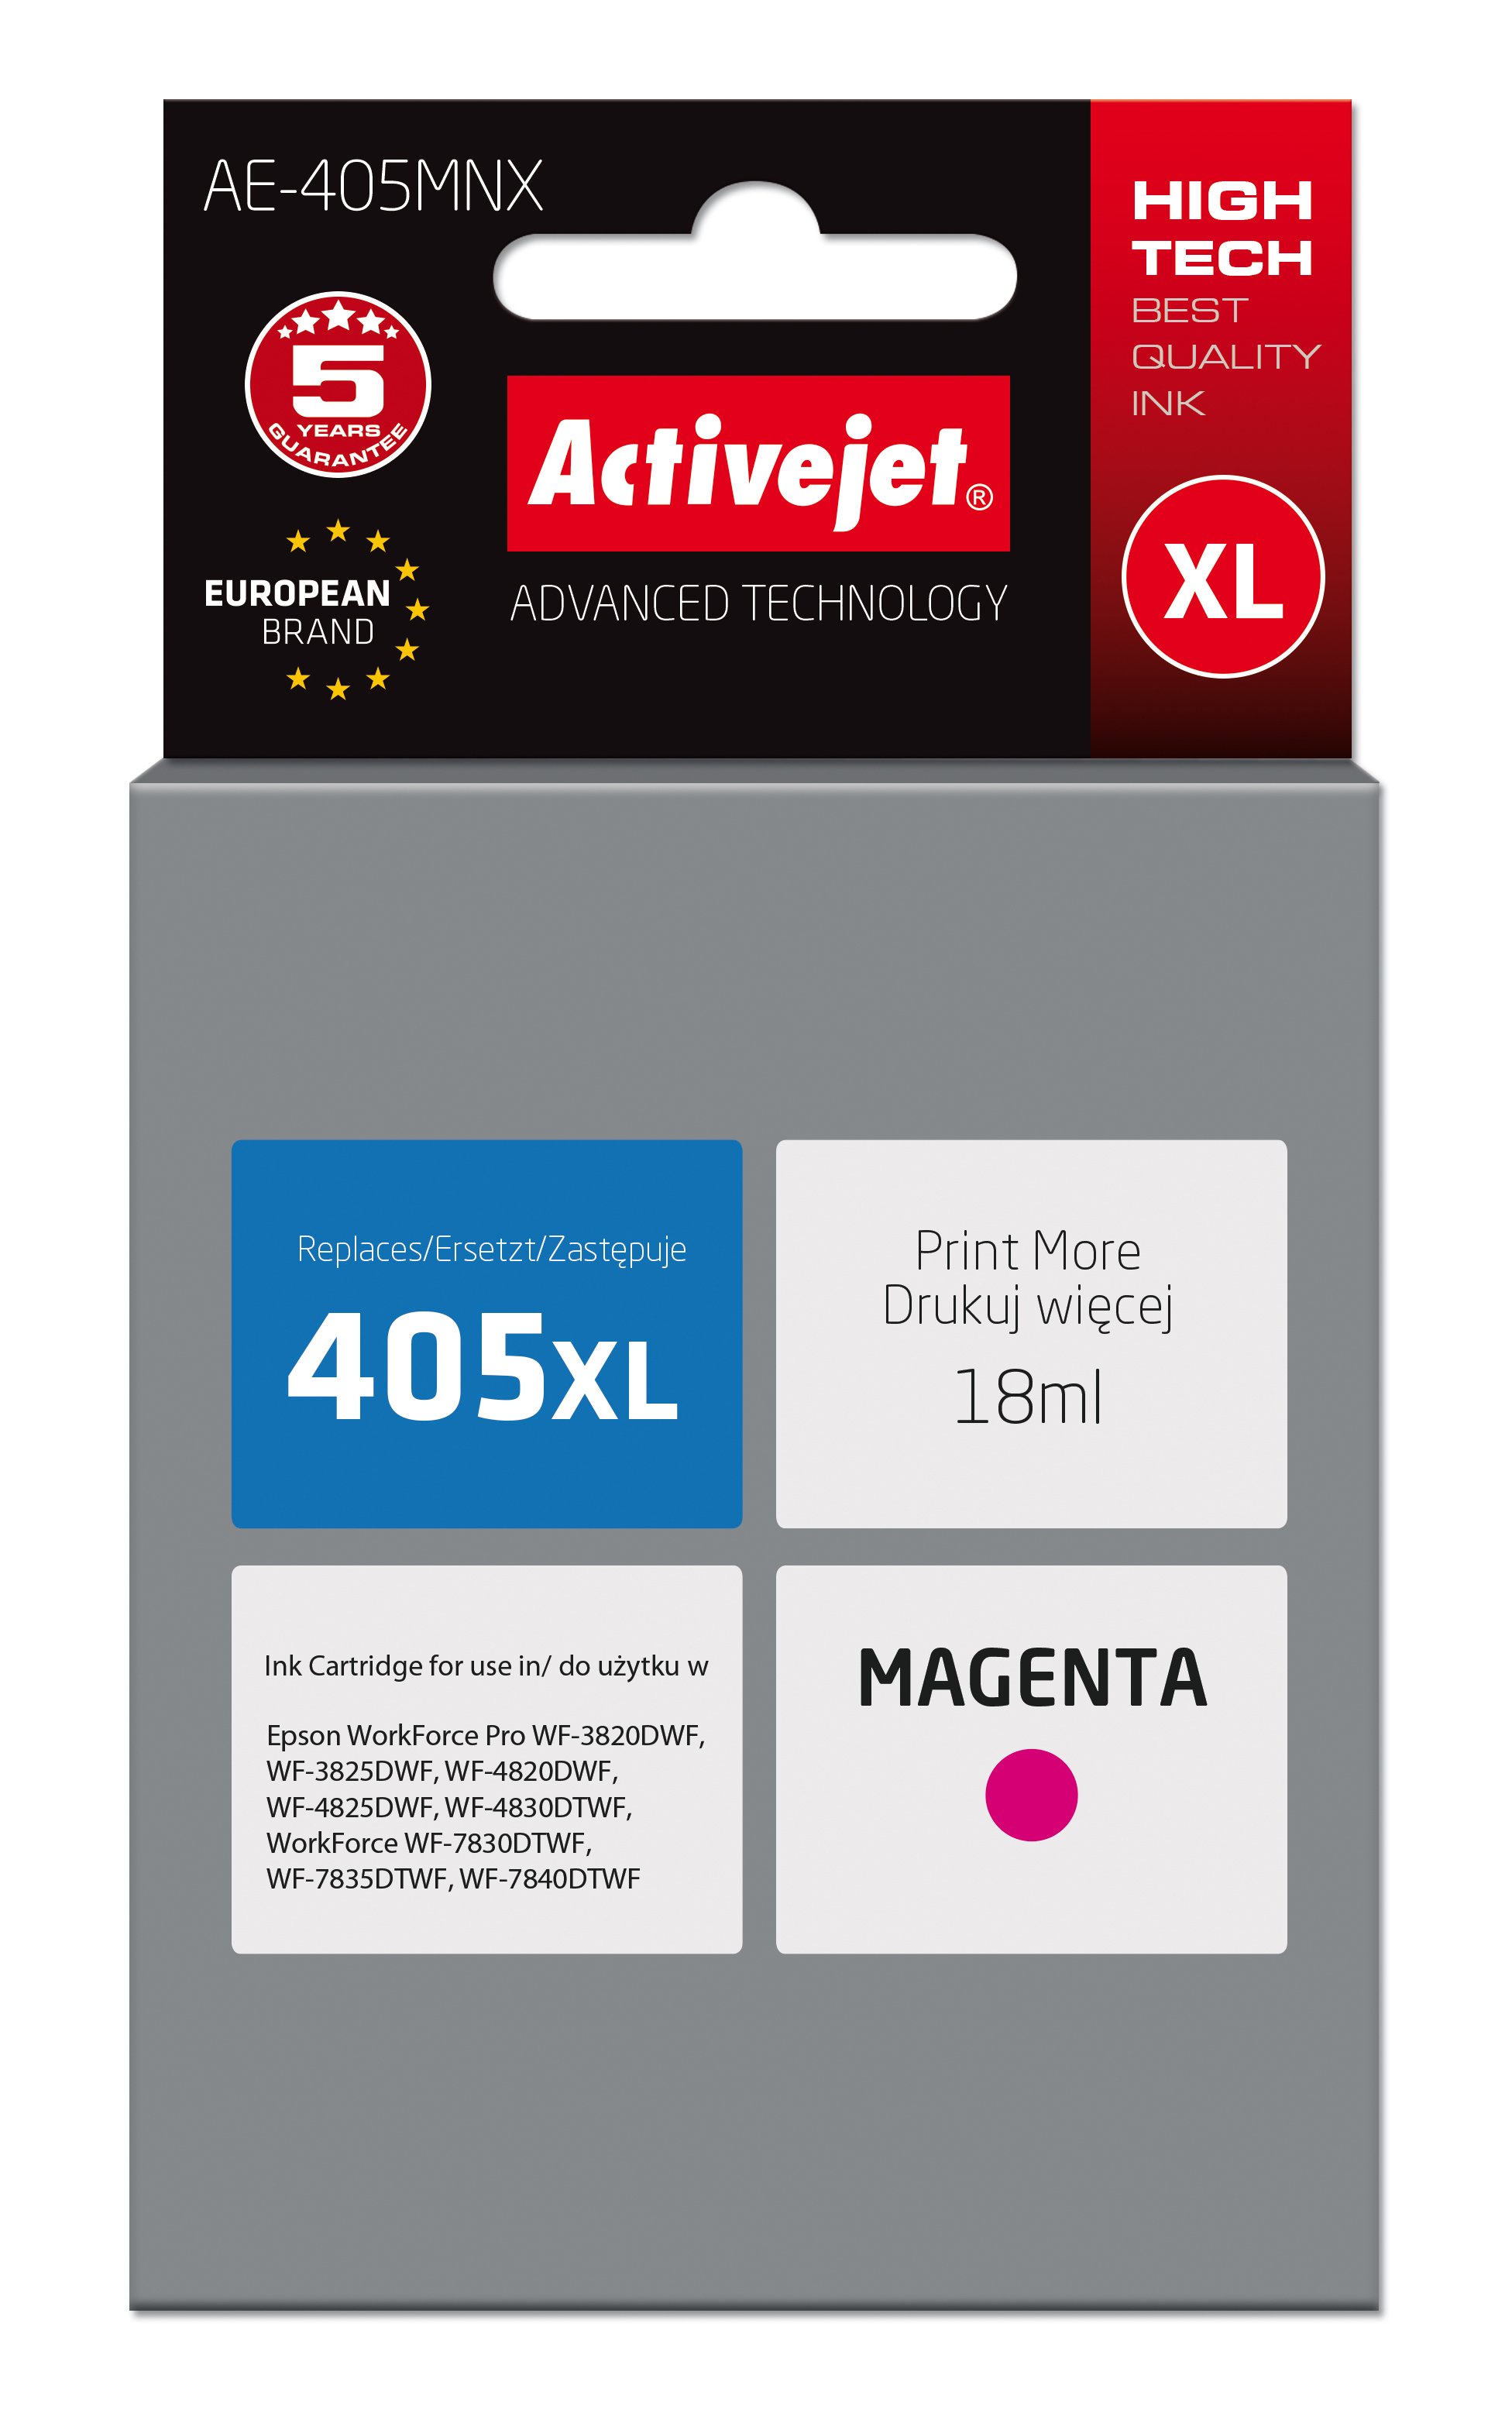 Tusz Activejet AE-405MNX do drukarki Epson, Zamiennik Epson 405XL C13T05H34010;  Supreme; 18 ml; purpurowy.